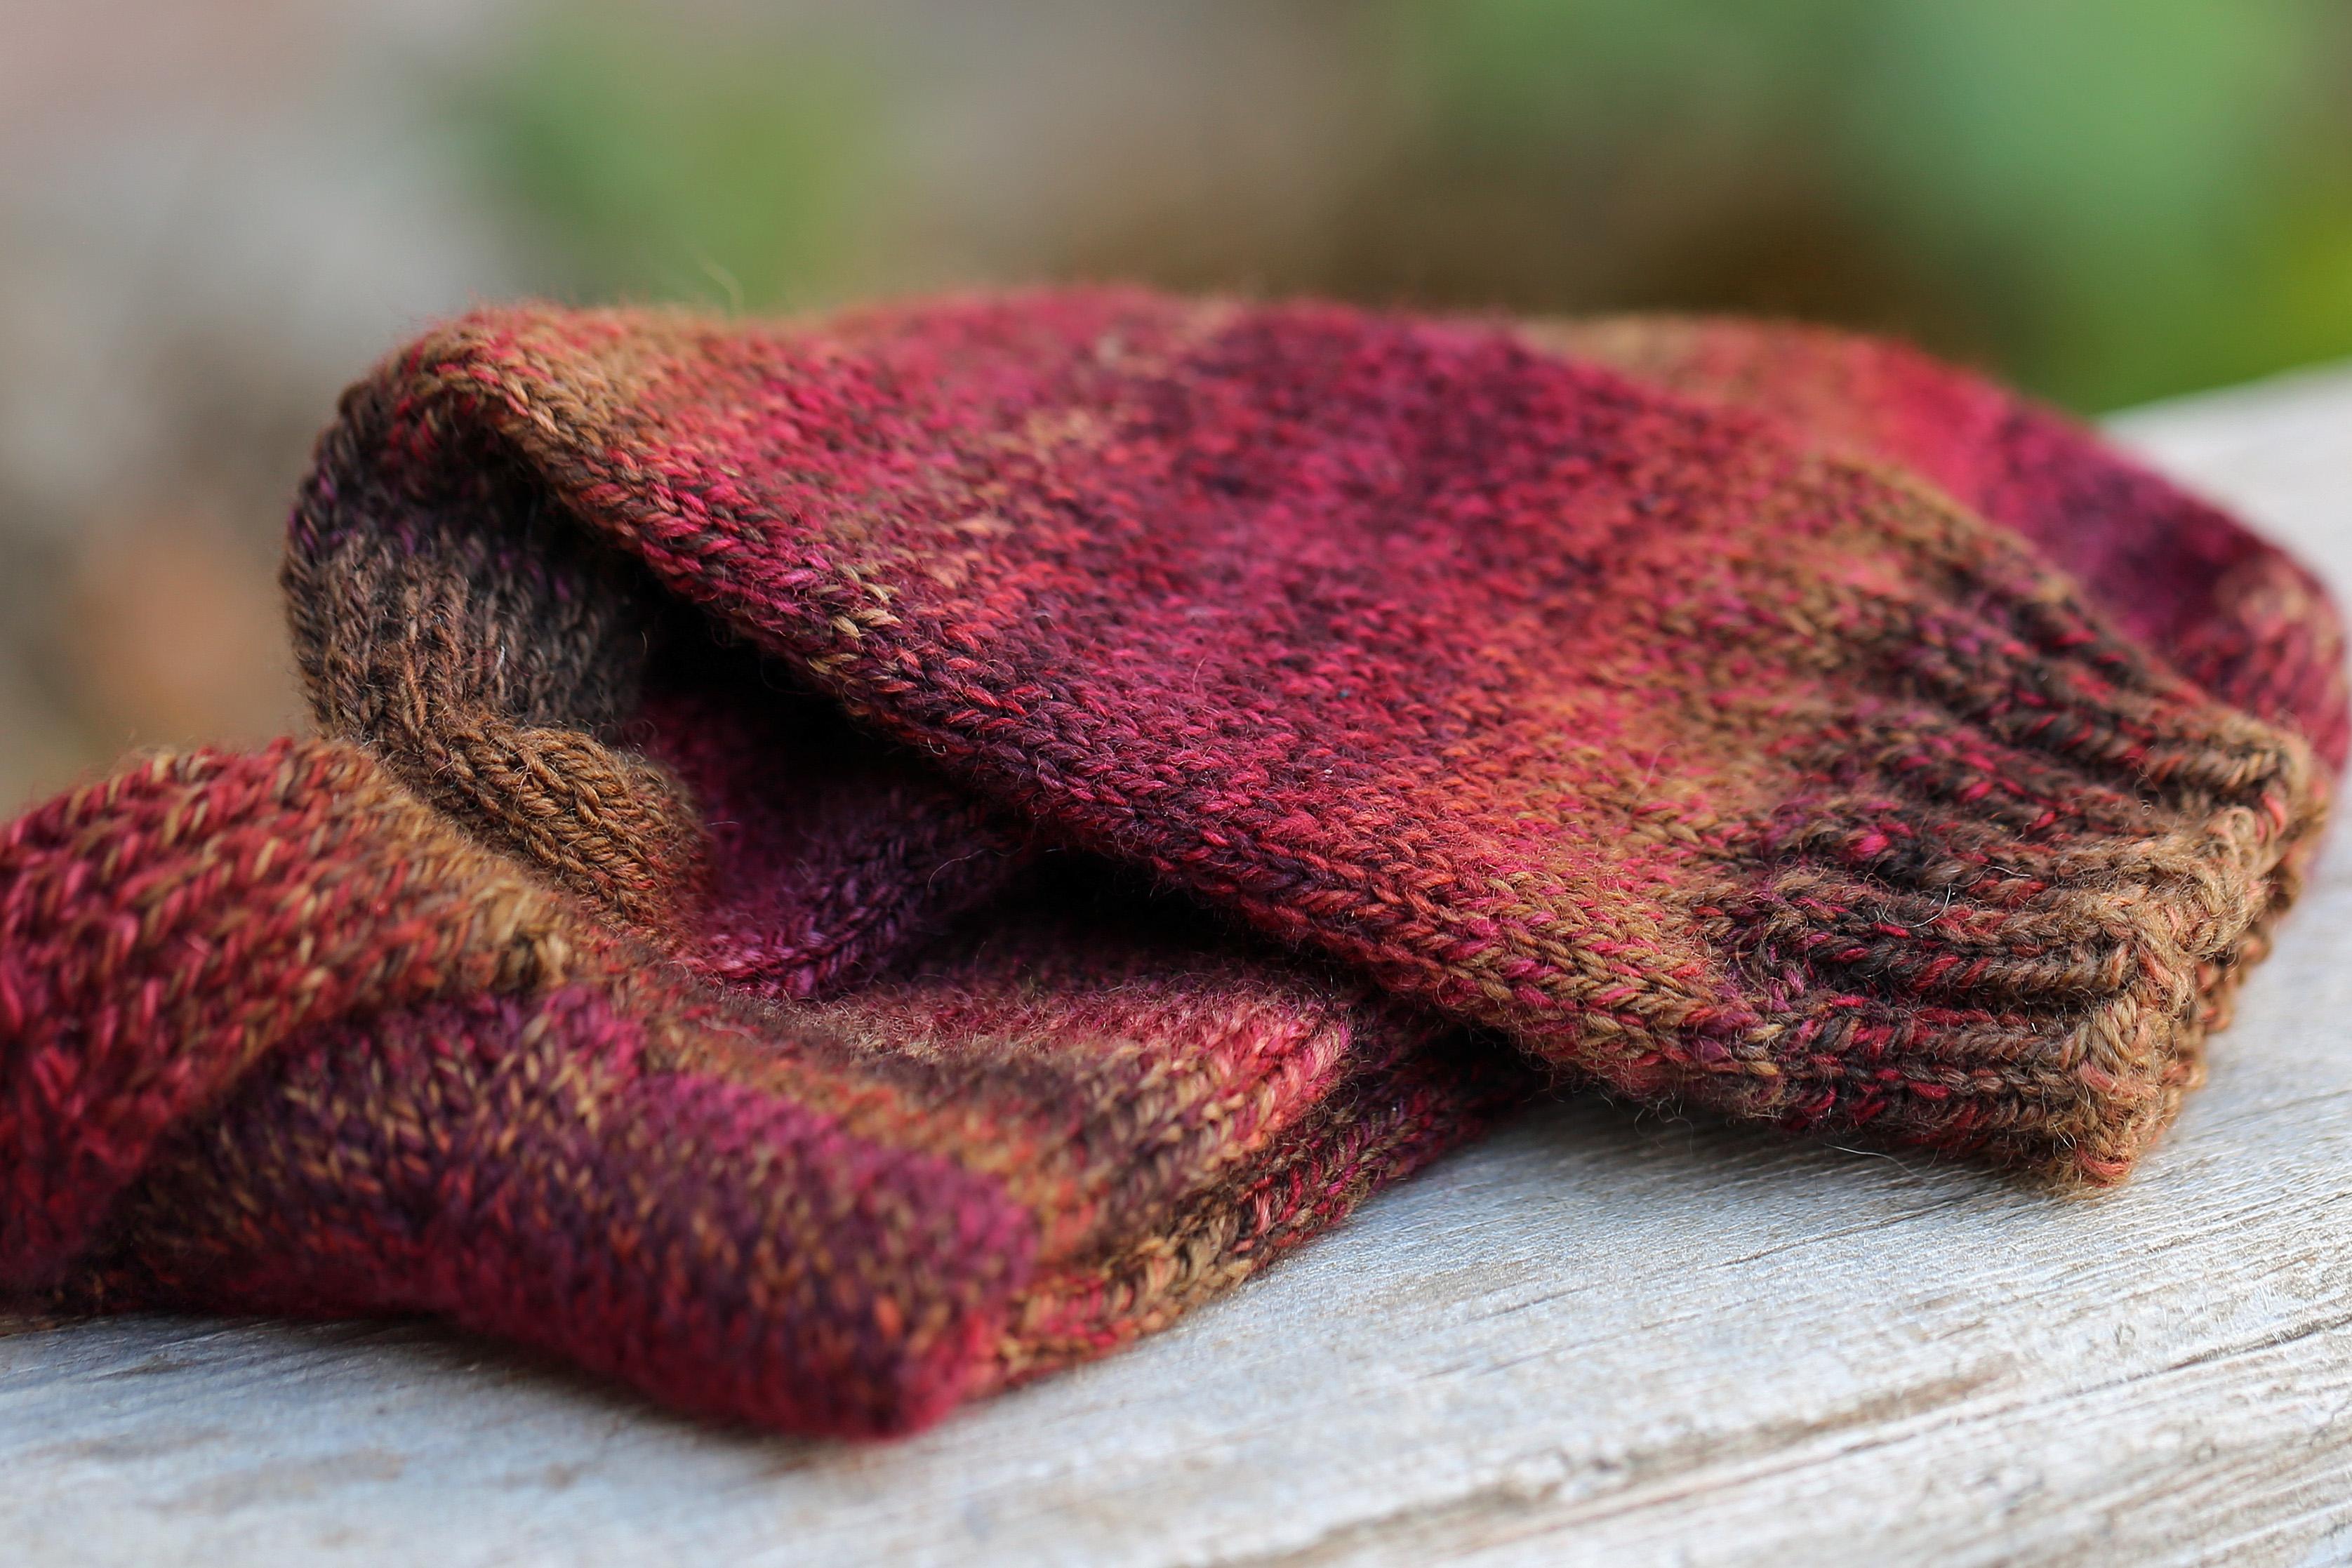 Shoshin Socks